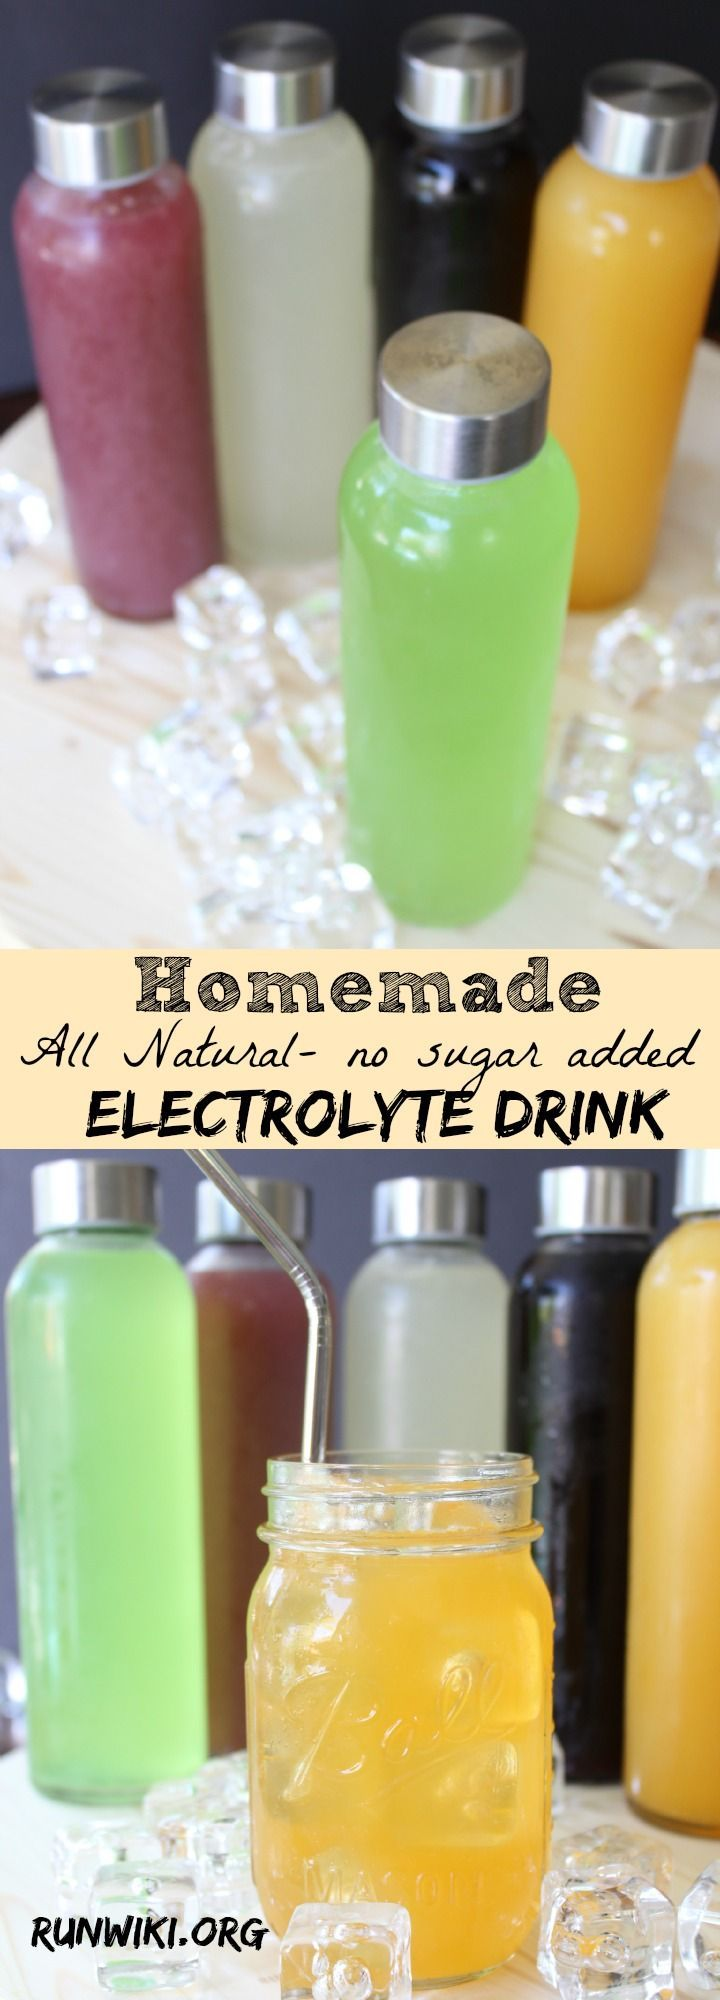 DIY Homemade All Natural Sugar Free Electrolyte Sports